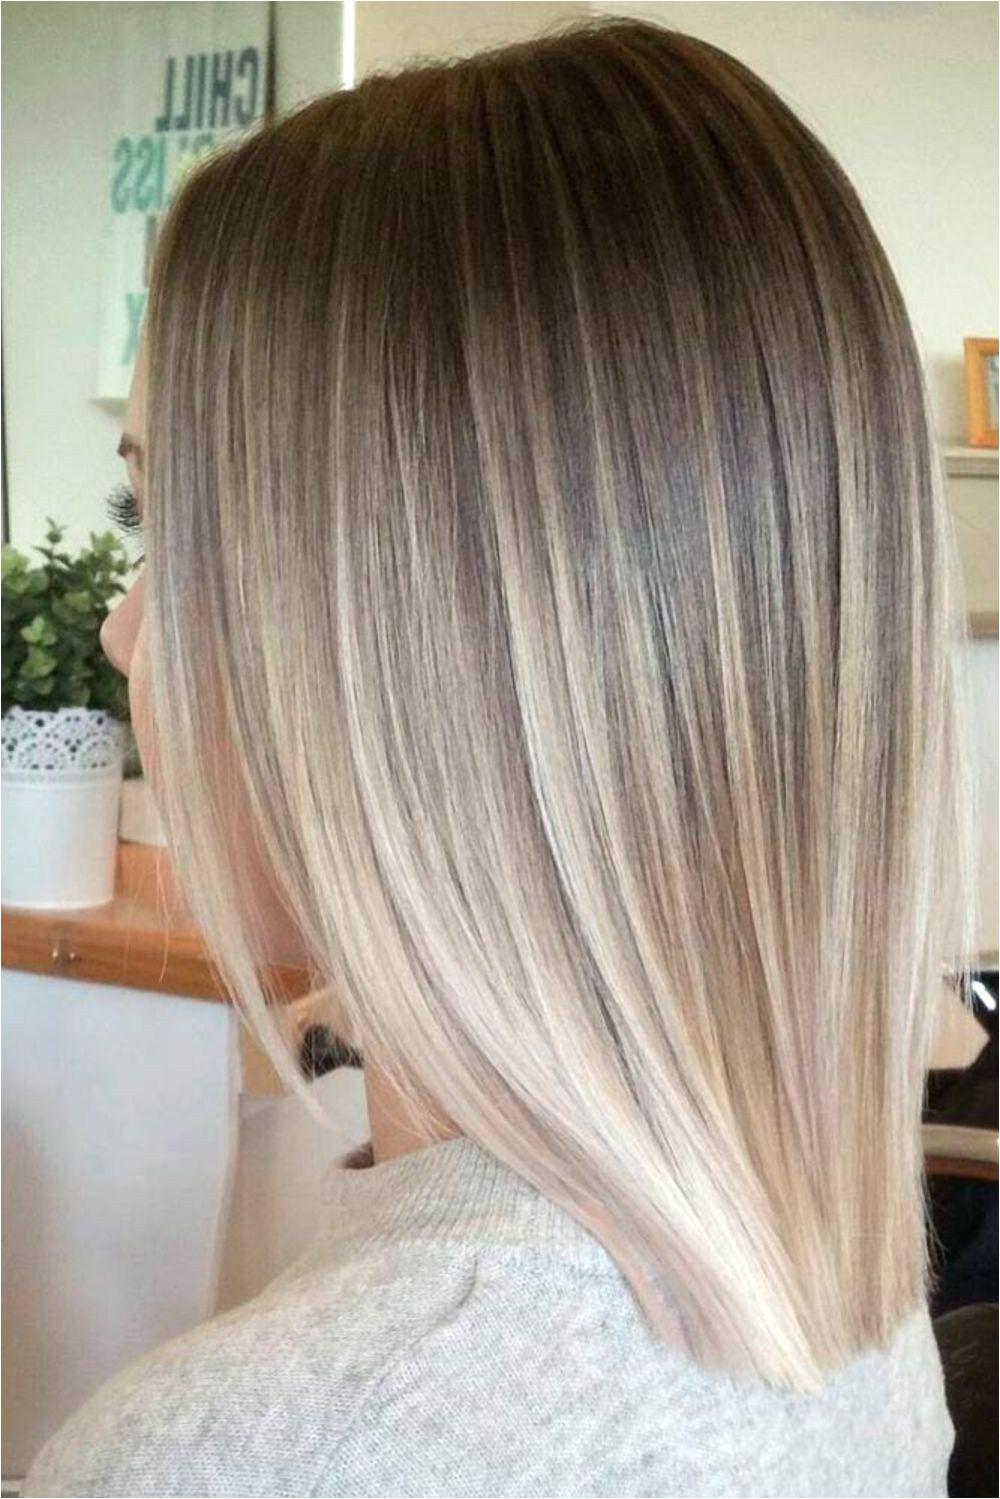 Pretty blonde hair color ideas 18 Fashionetter